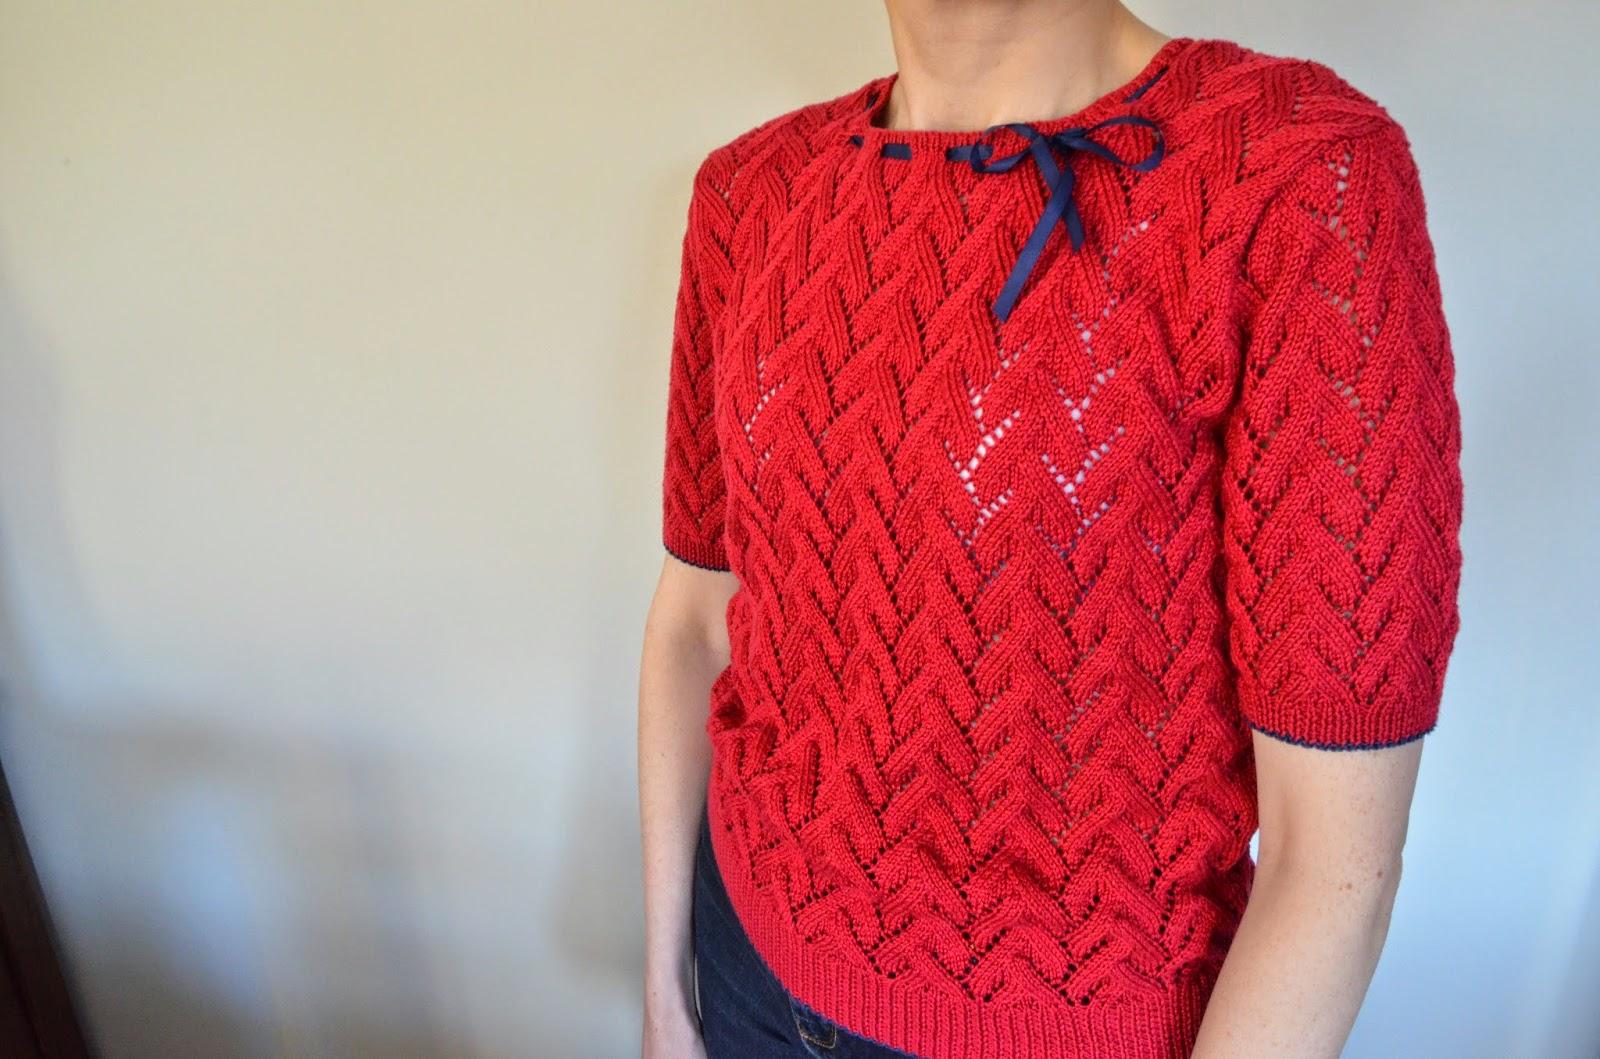 Rowan Knitting Patterns Errata : Patsy - Sarah Dallas (Rowan 32) Pattern Error Solution